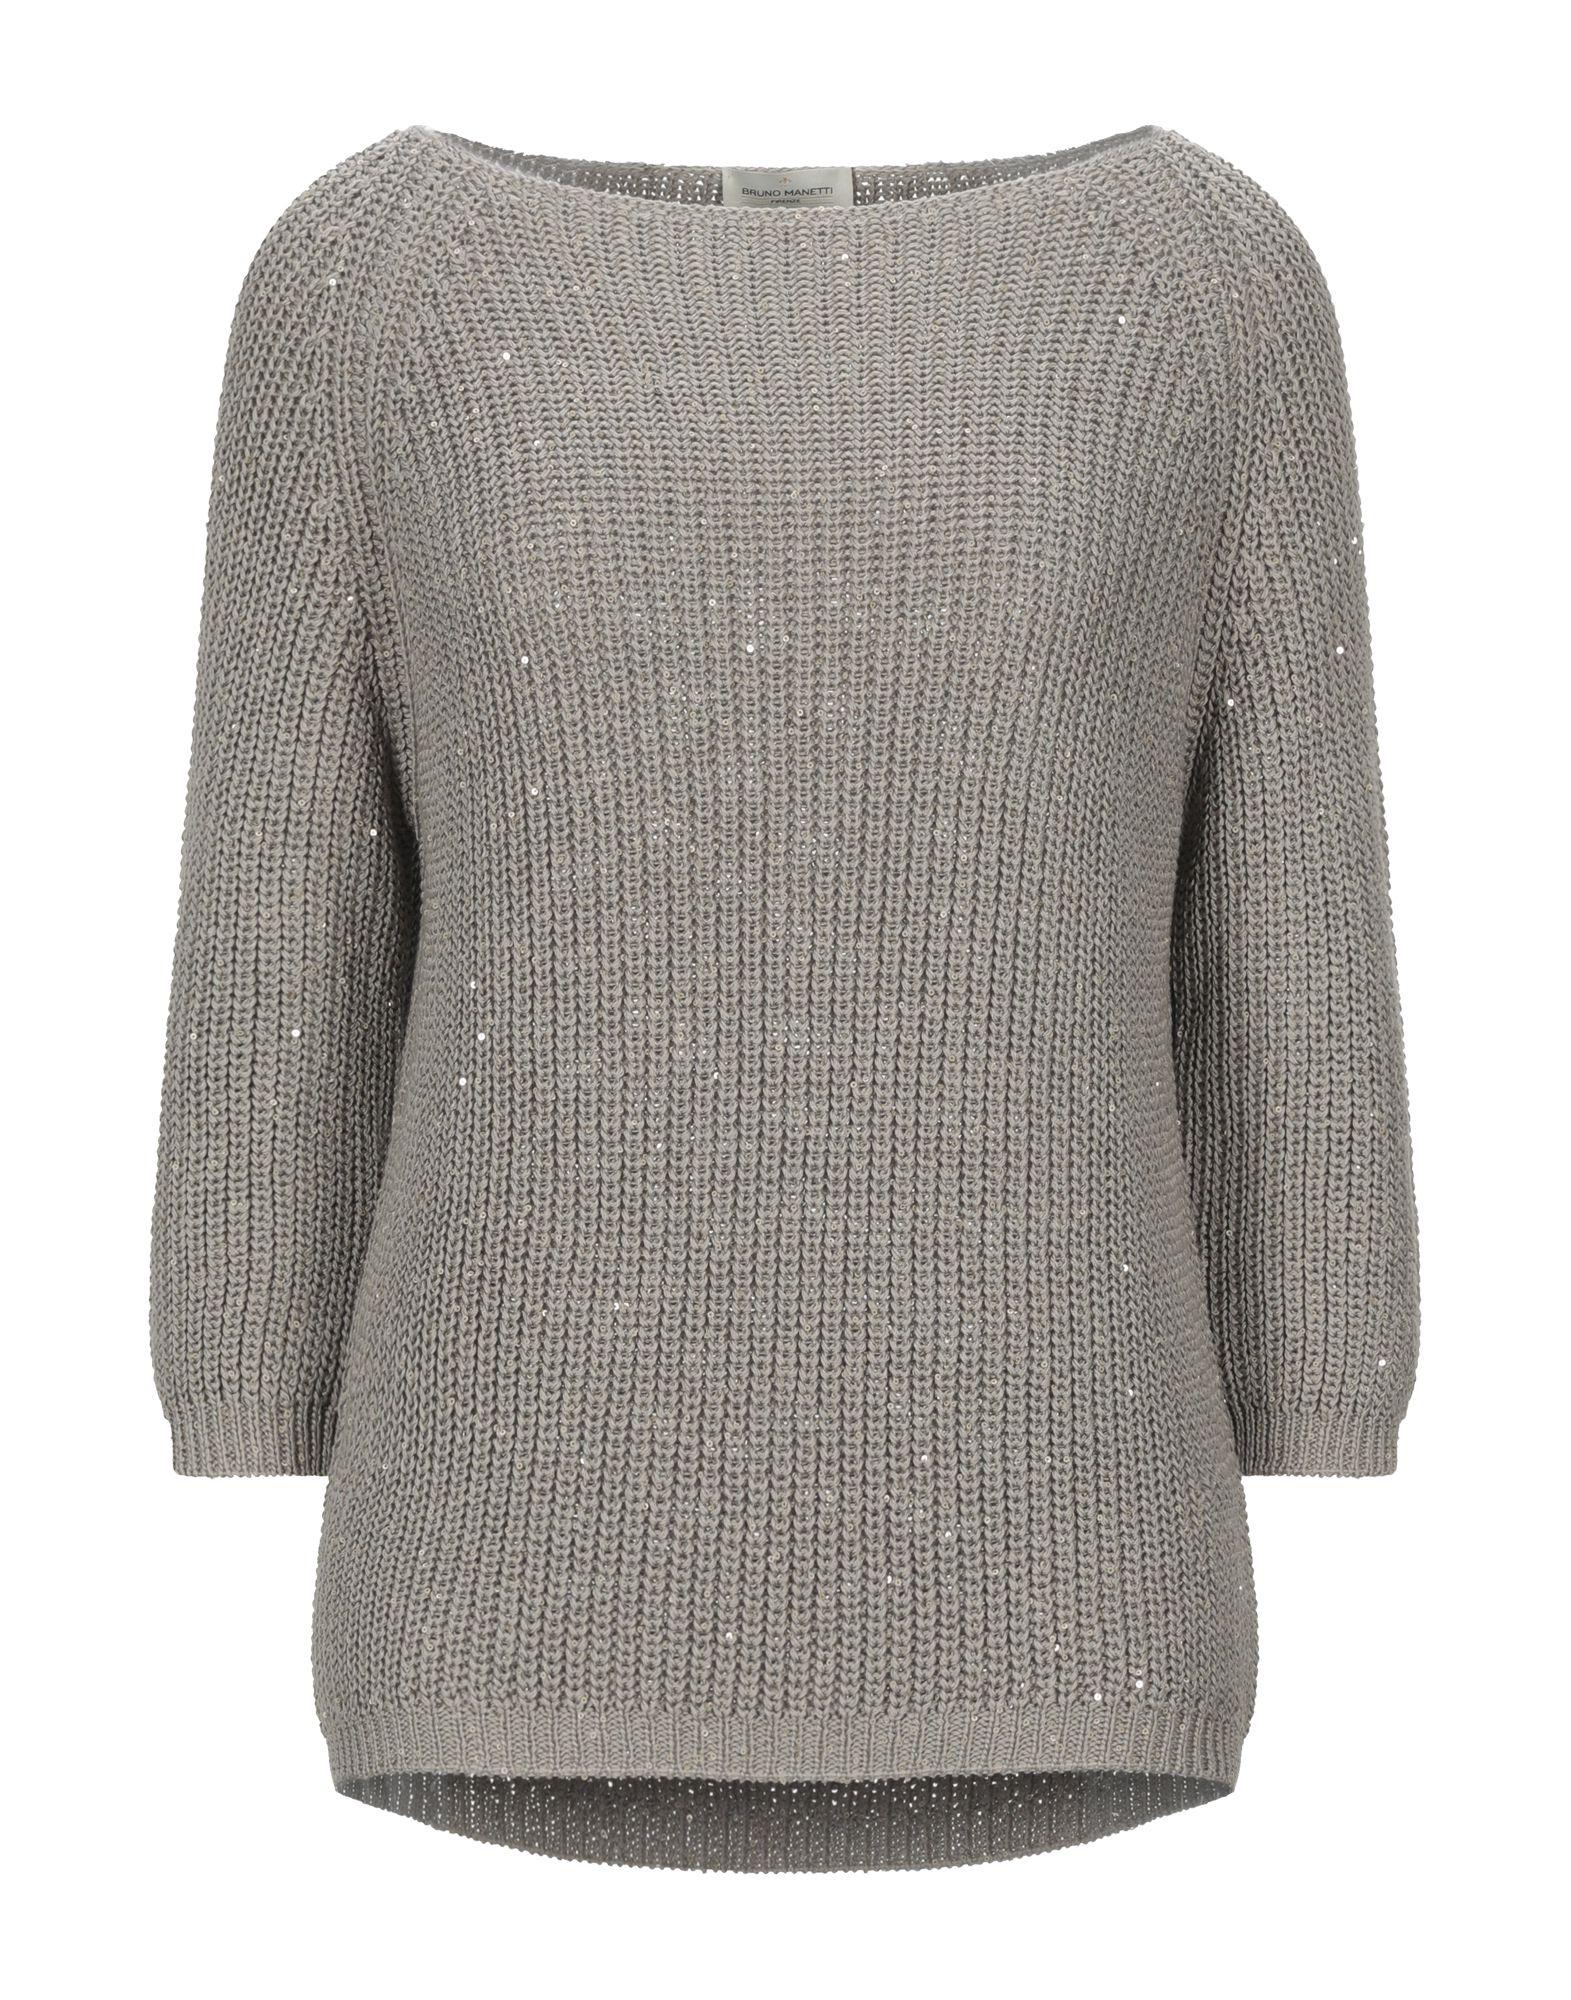 BRUNO MANETTI Sweaters - Item 14042560